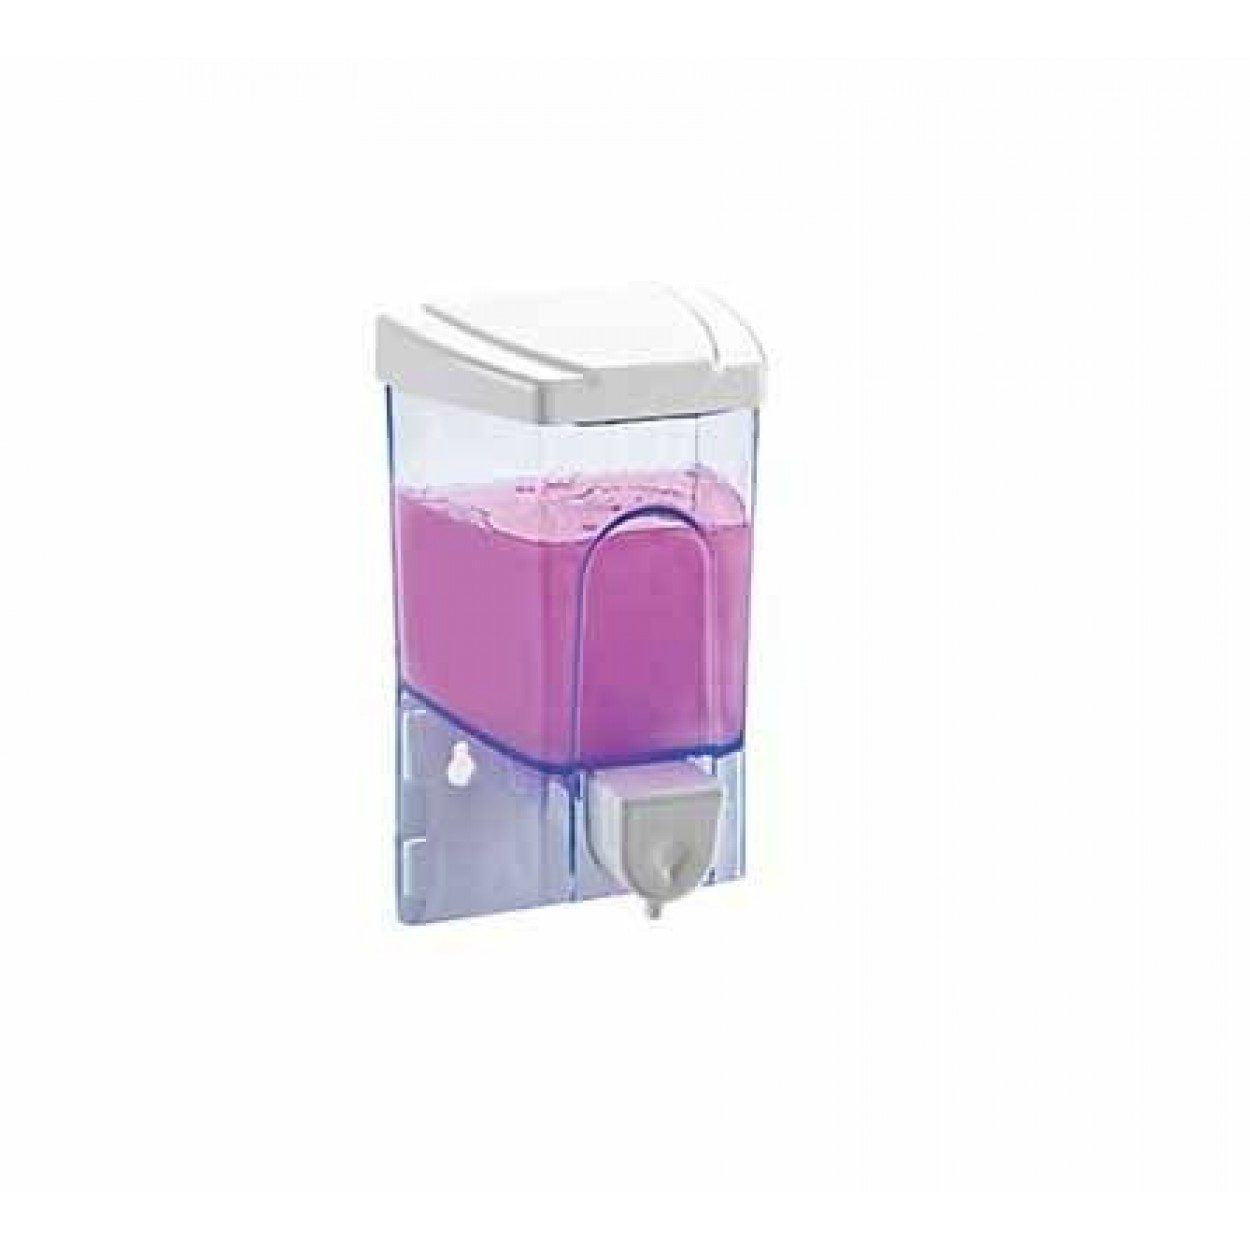 Dikey Sıvı Sabunluk 500 Gr (Şeffaf)